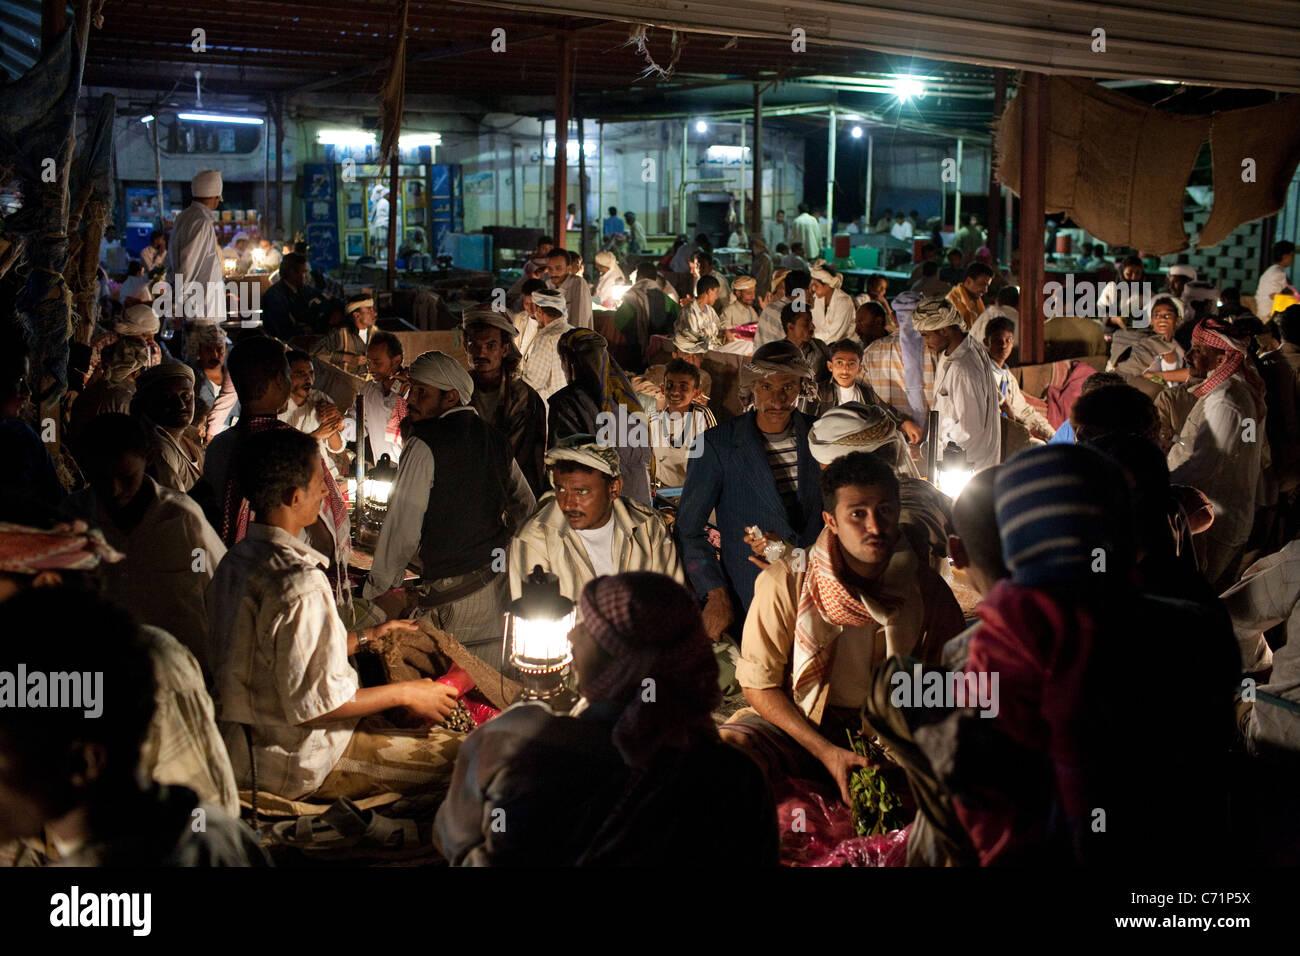 The night khat market in Zabid, Yemen. - Stock Image